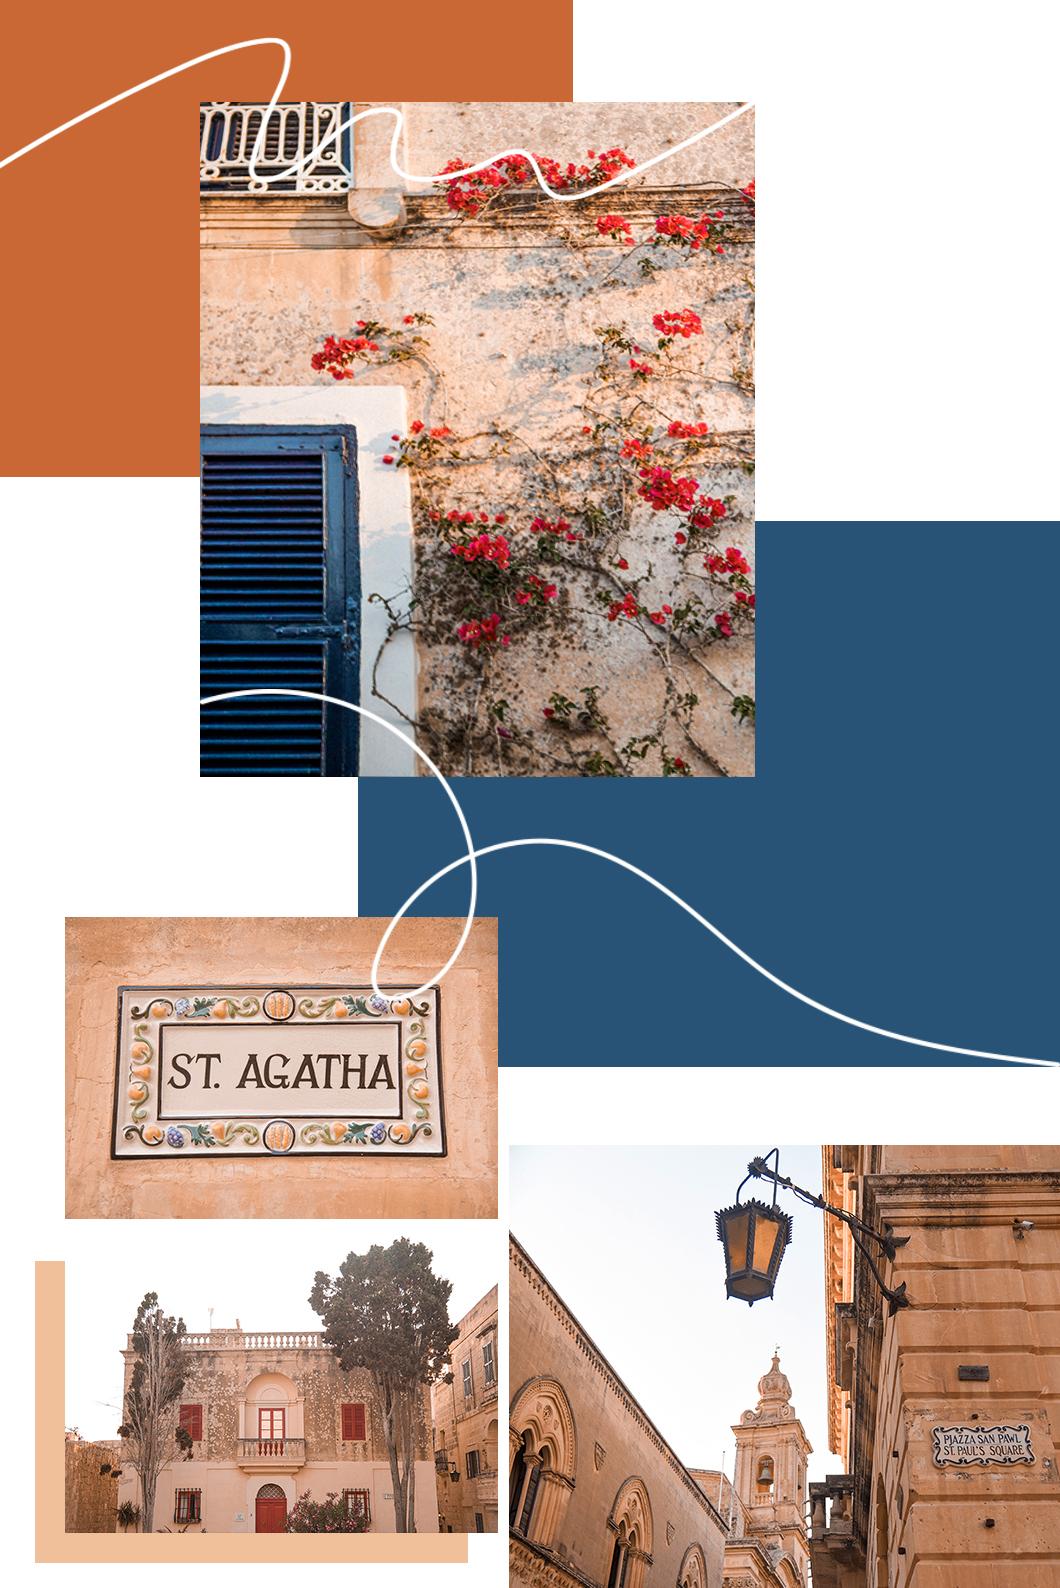 Visiter Mdina à Malte